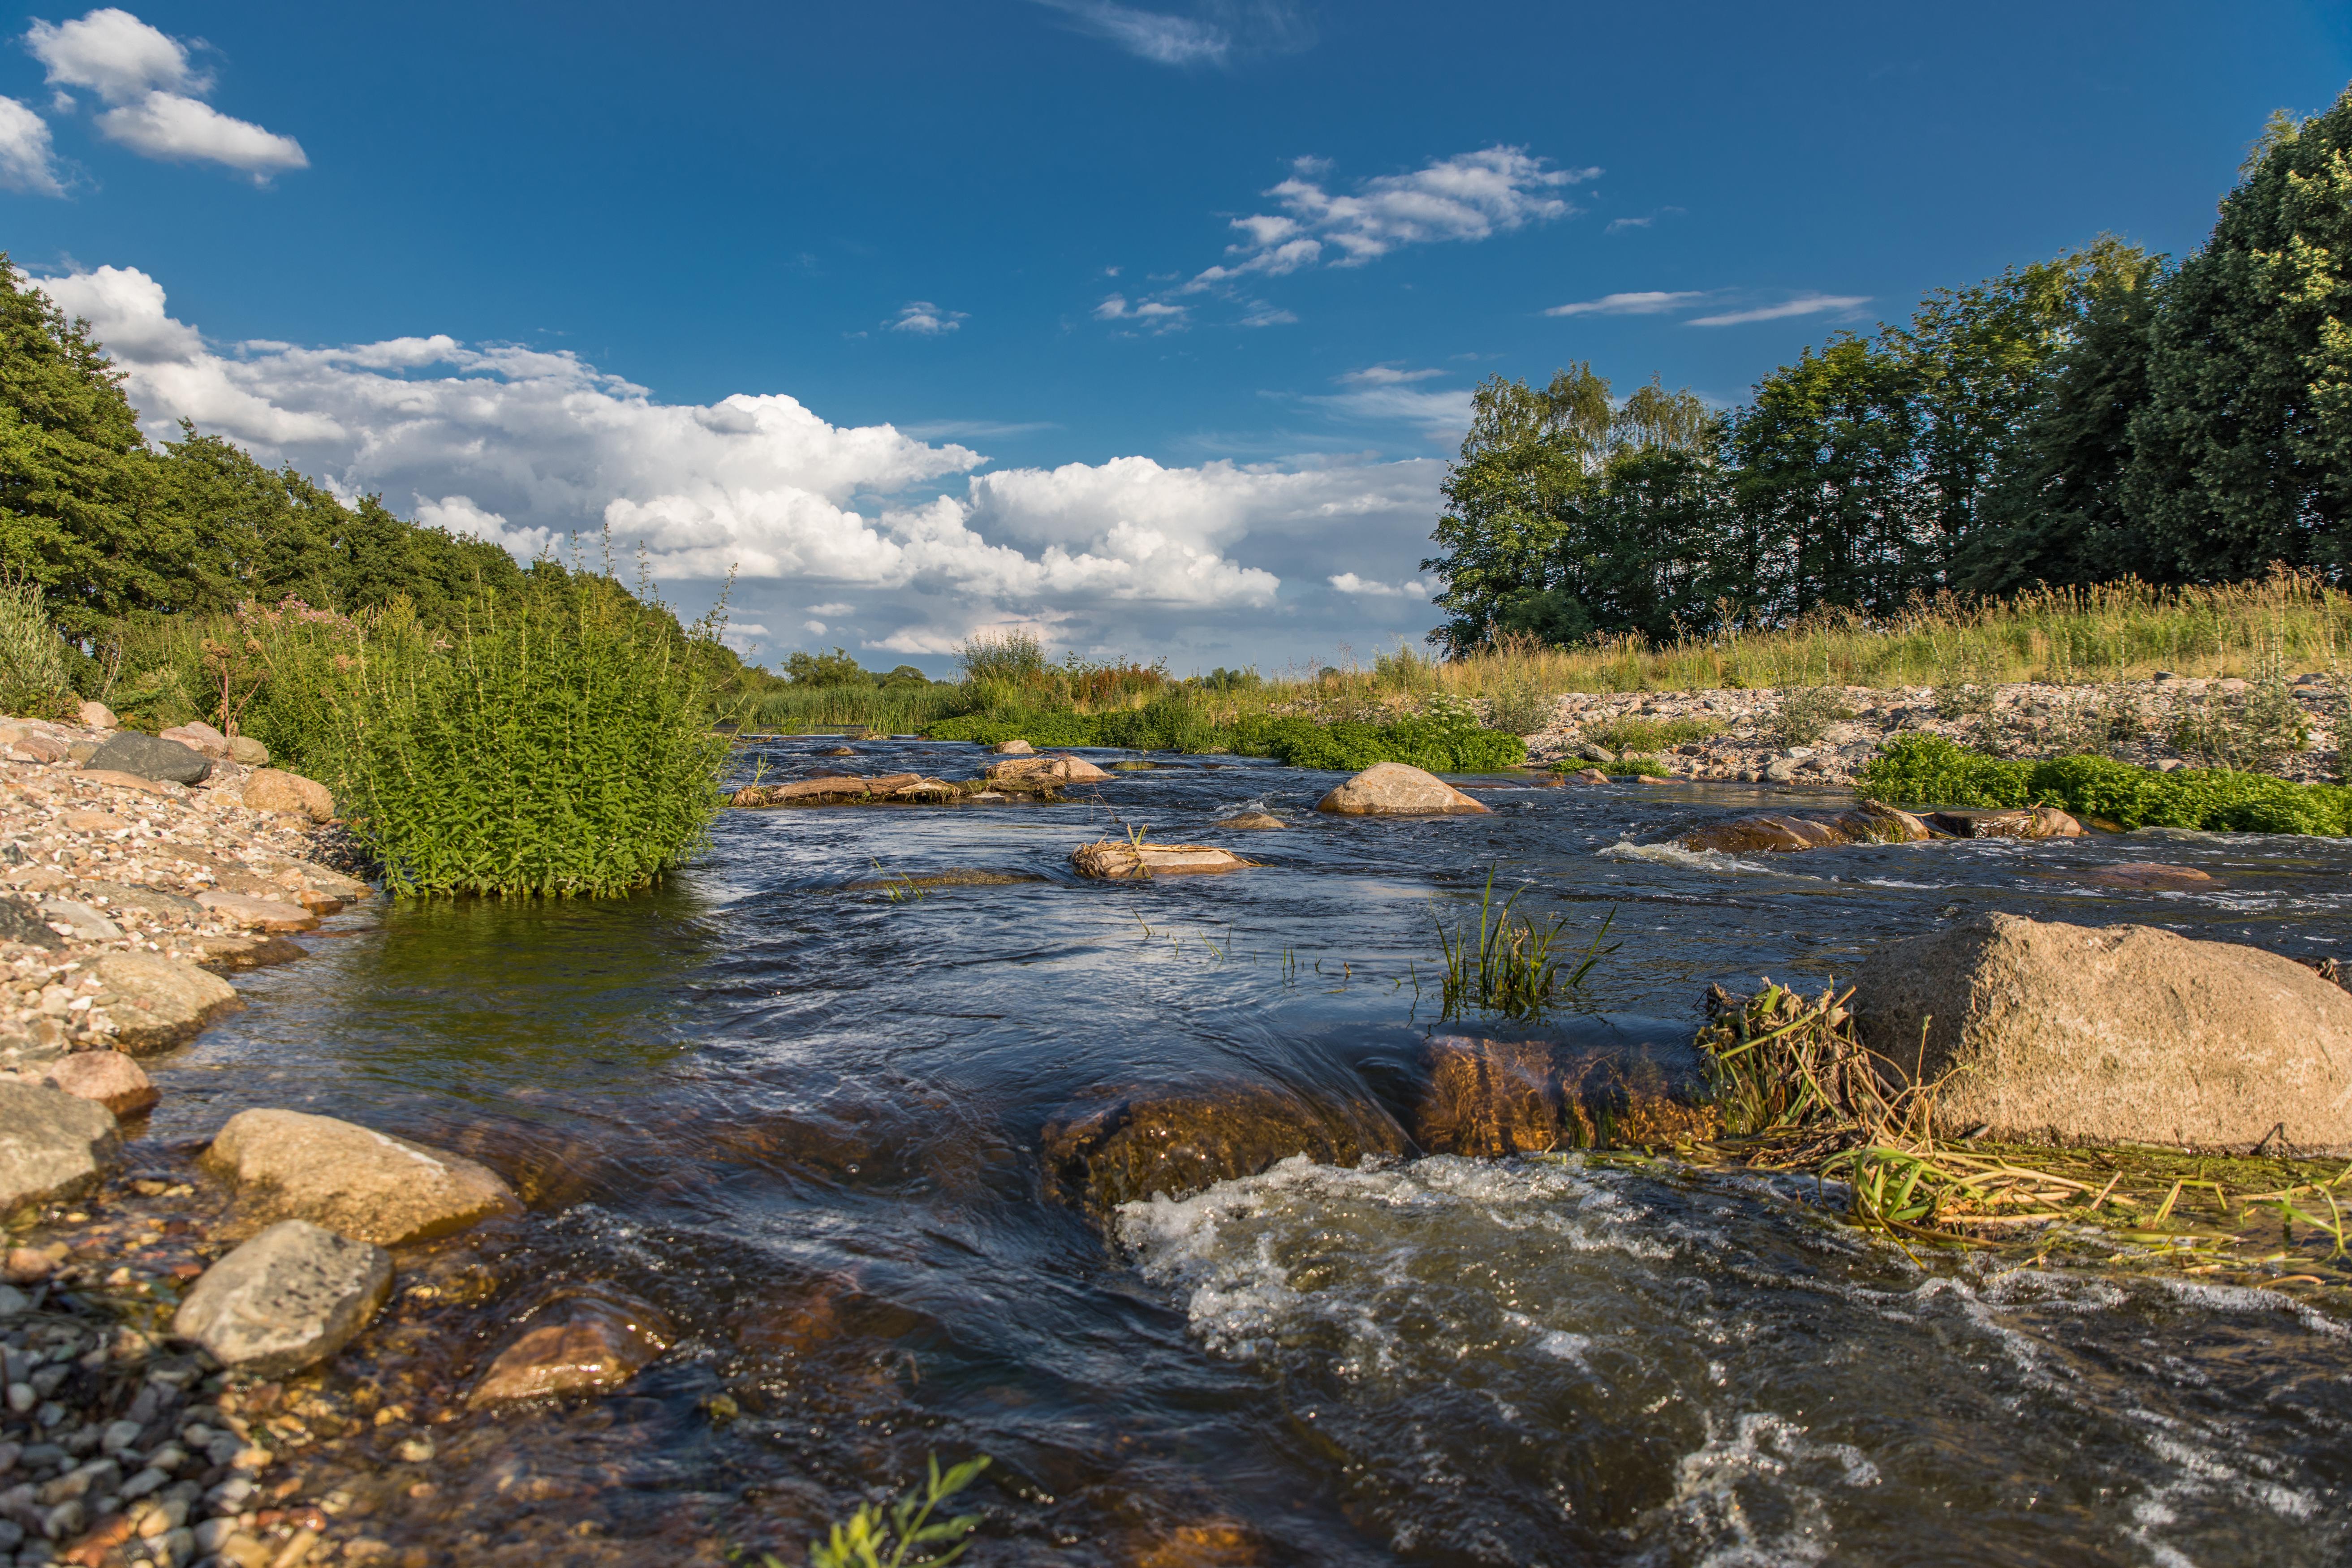 Вода реки картинка